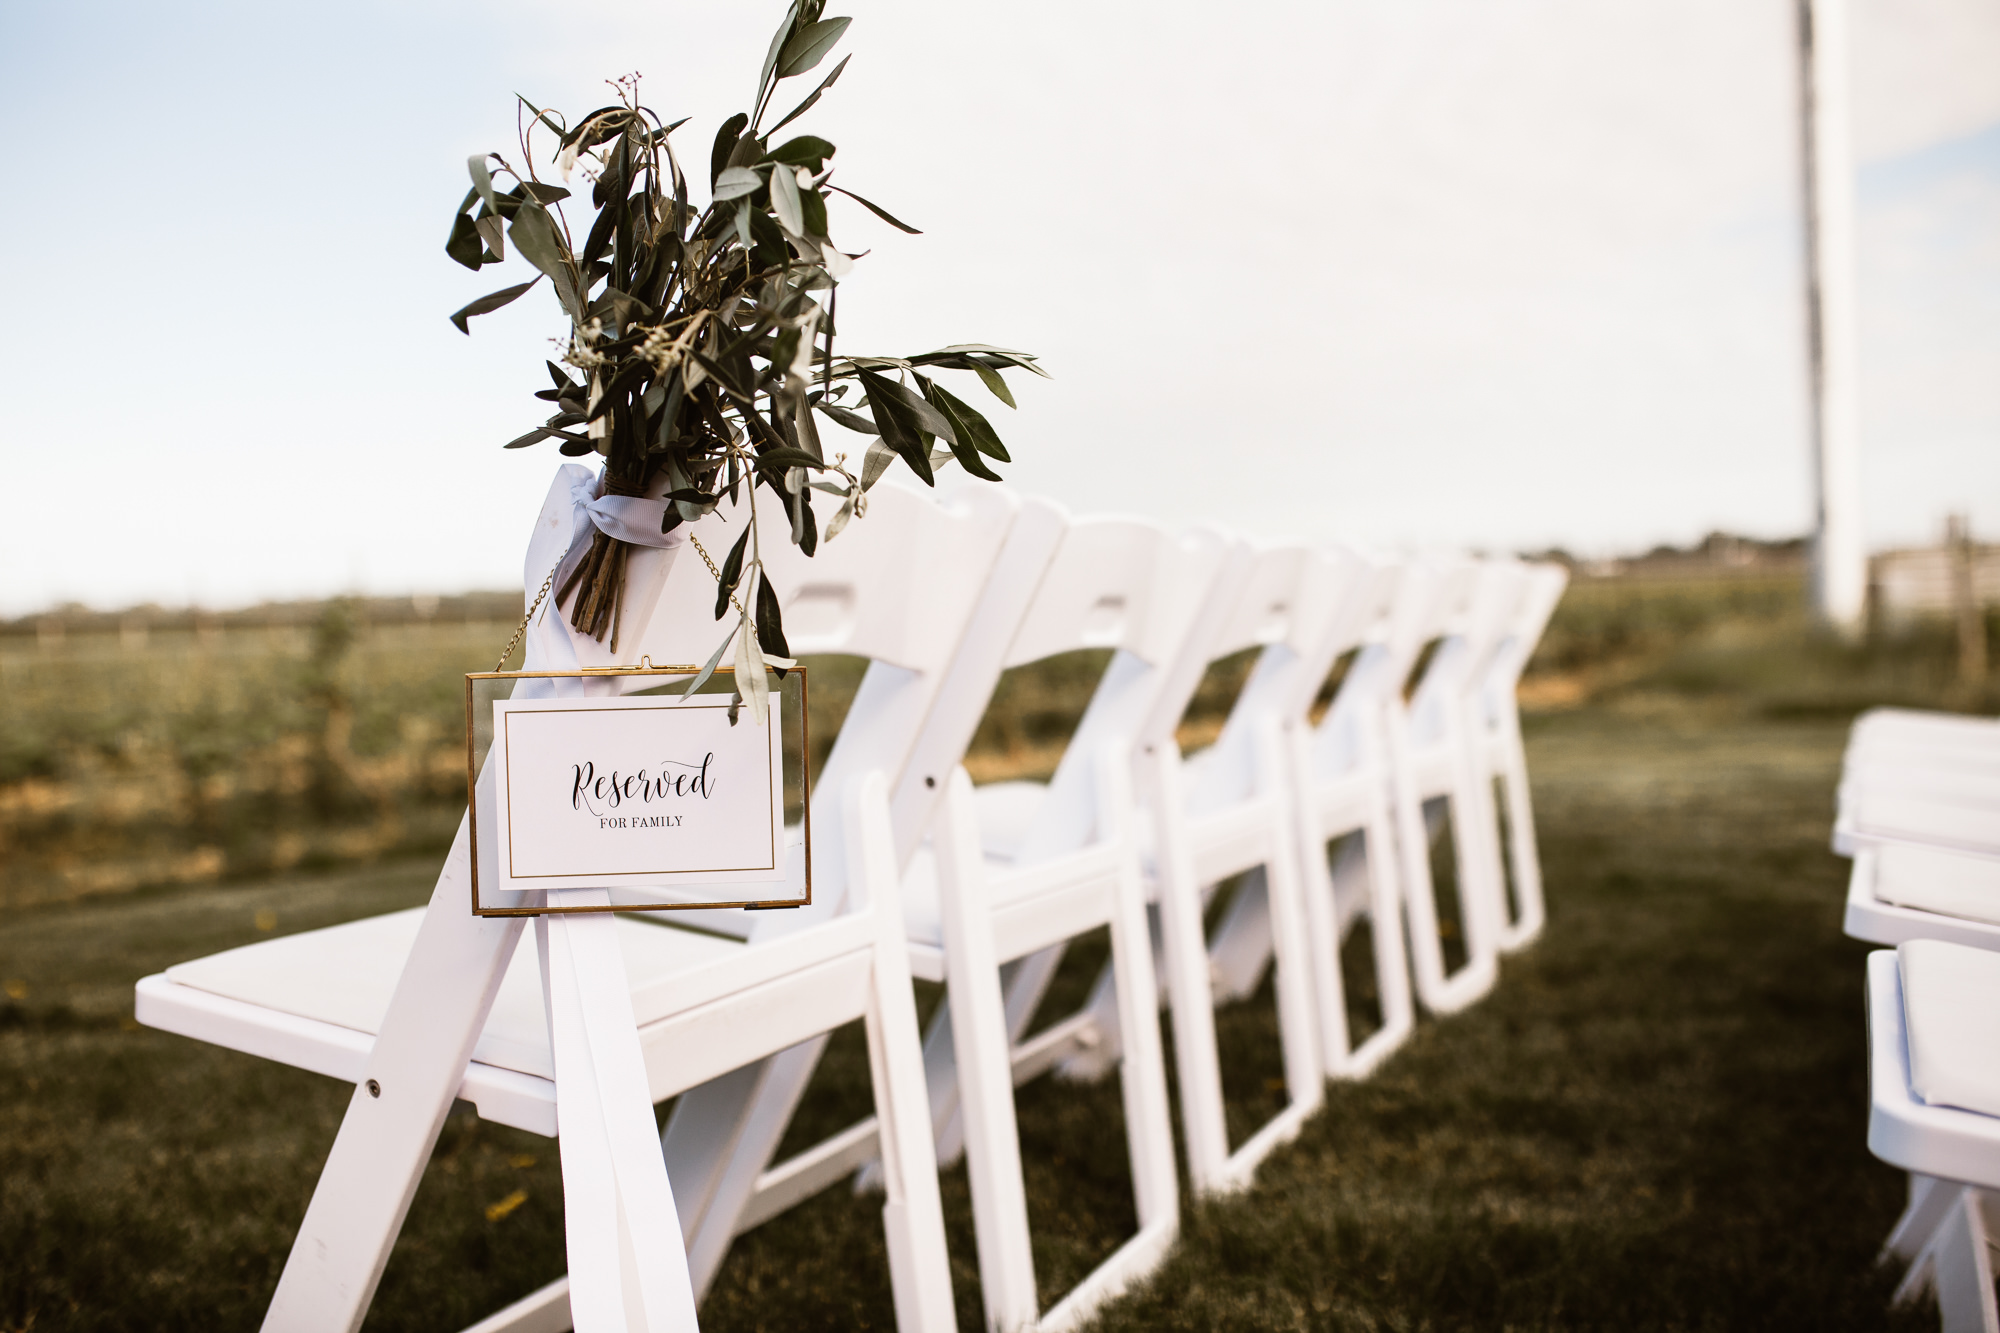 stratus-winery-wedding-vineyard-wedding-vineyard-bride-photo-by-reed-photography-033.jpg